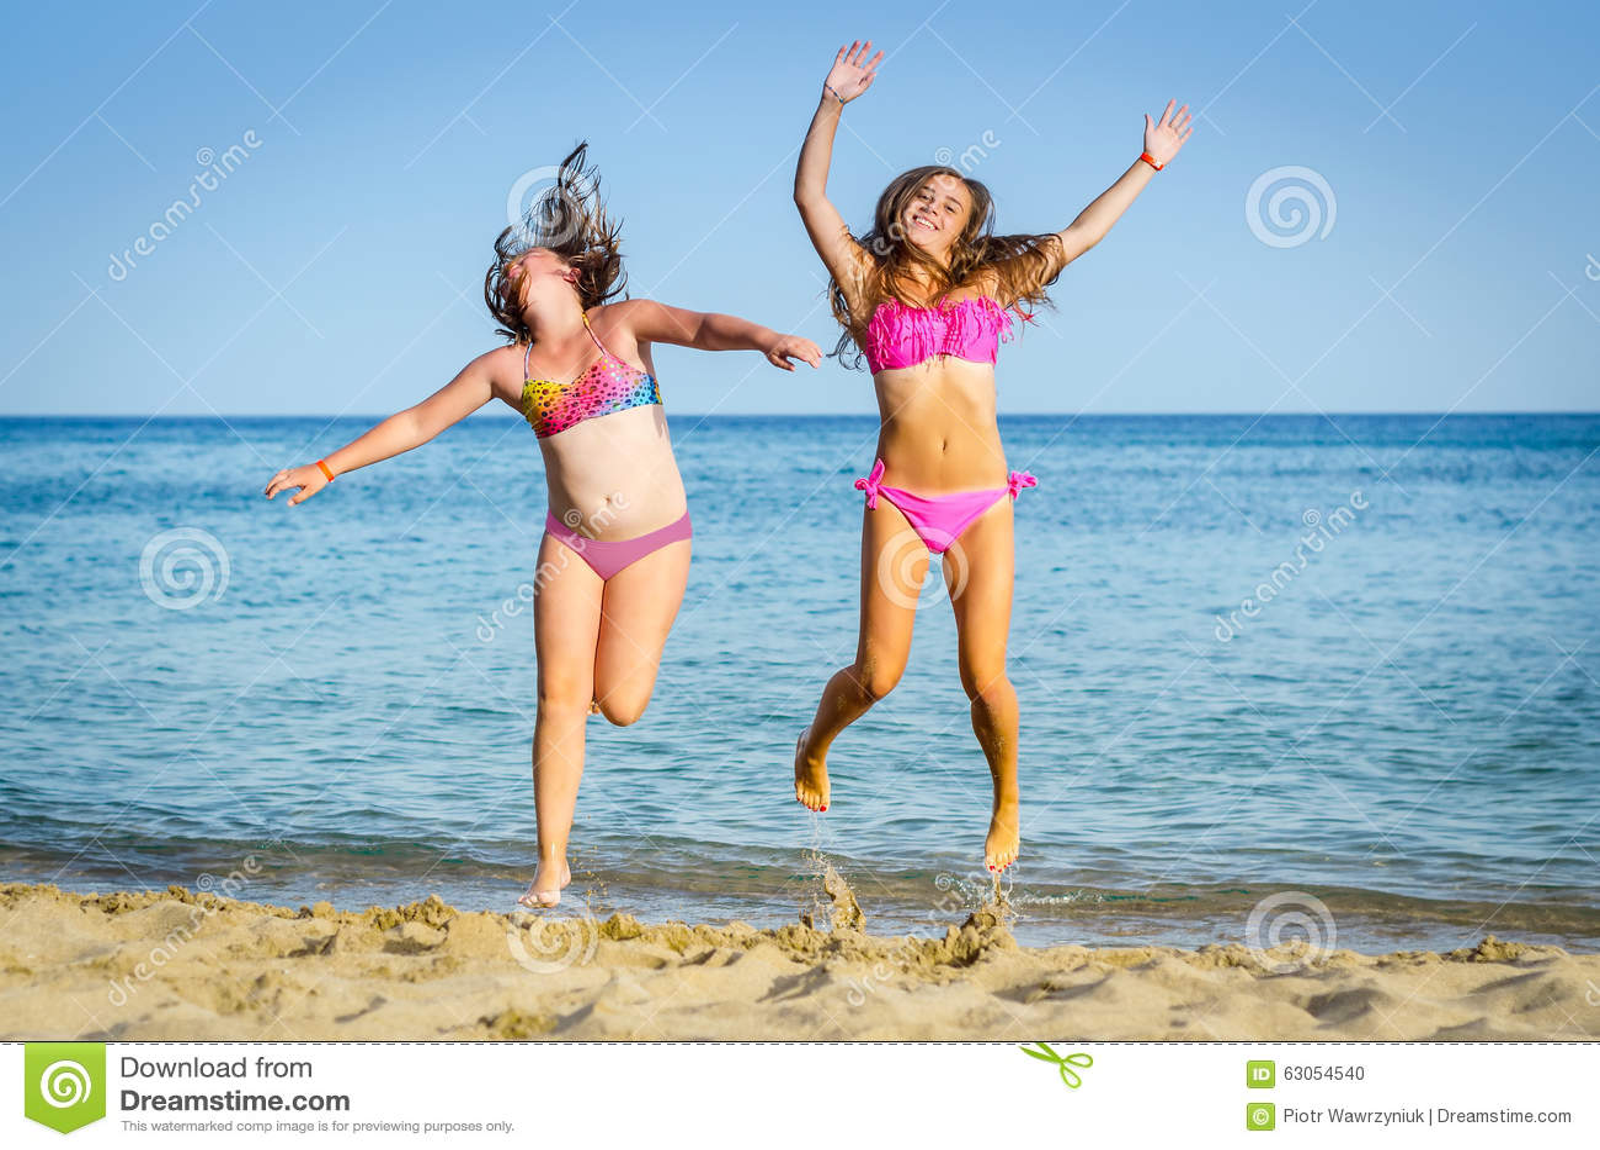 2dd42ac138e25 Girls Jumping On Tropical Beach Stock Photo - Image of having ...